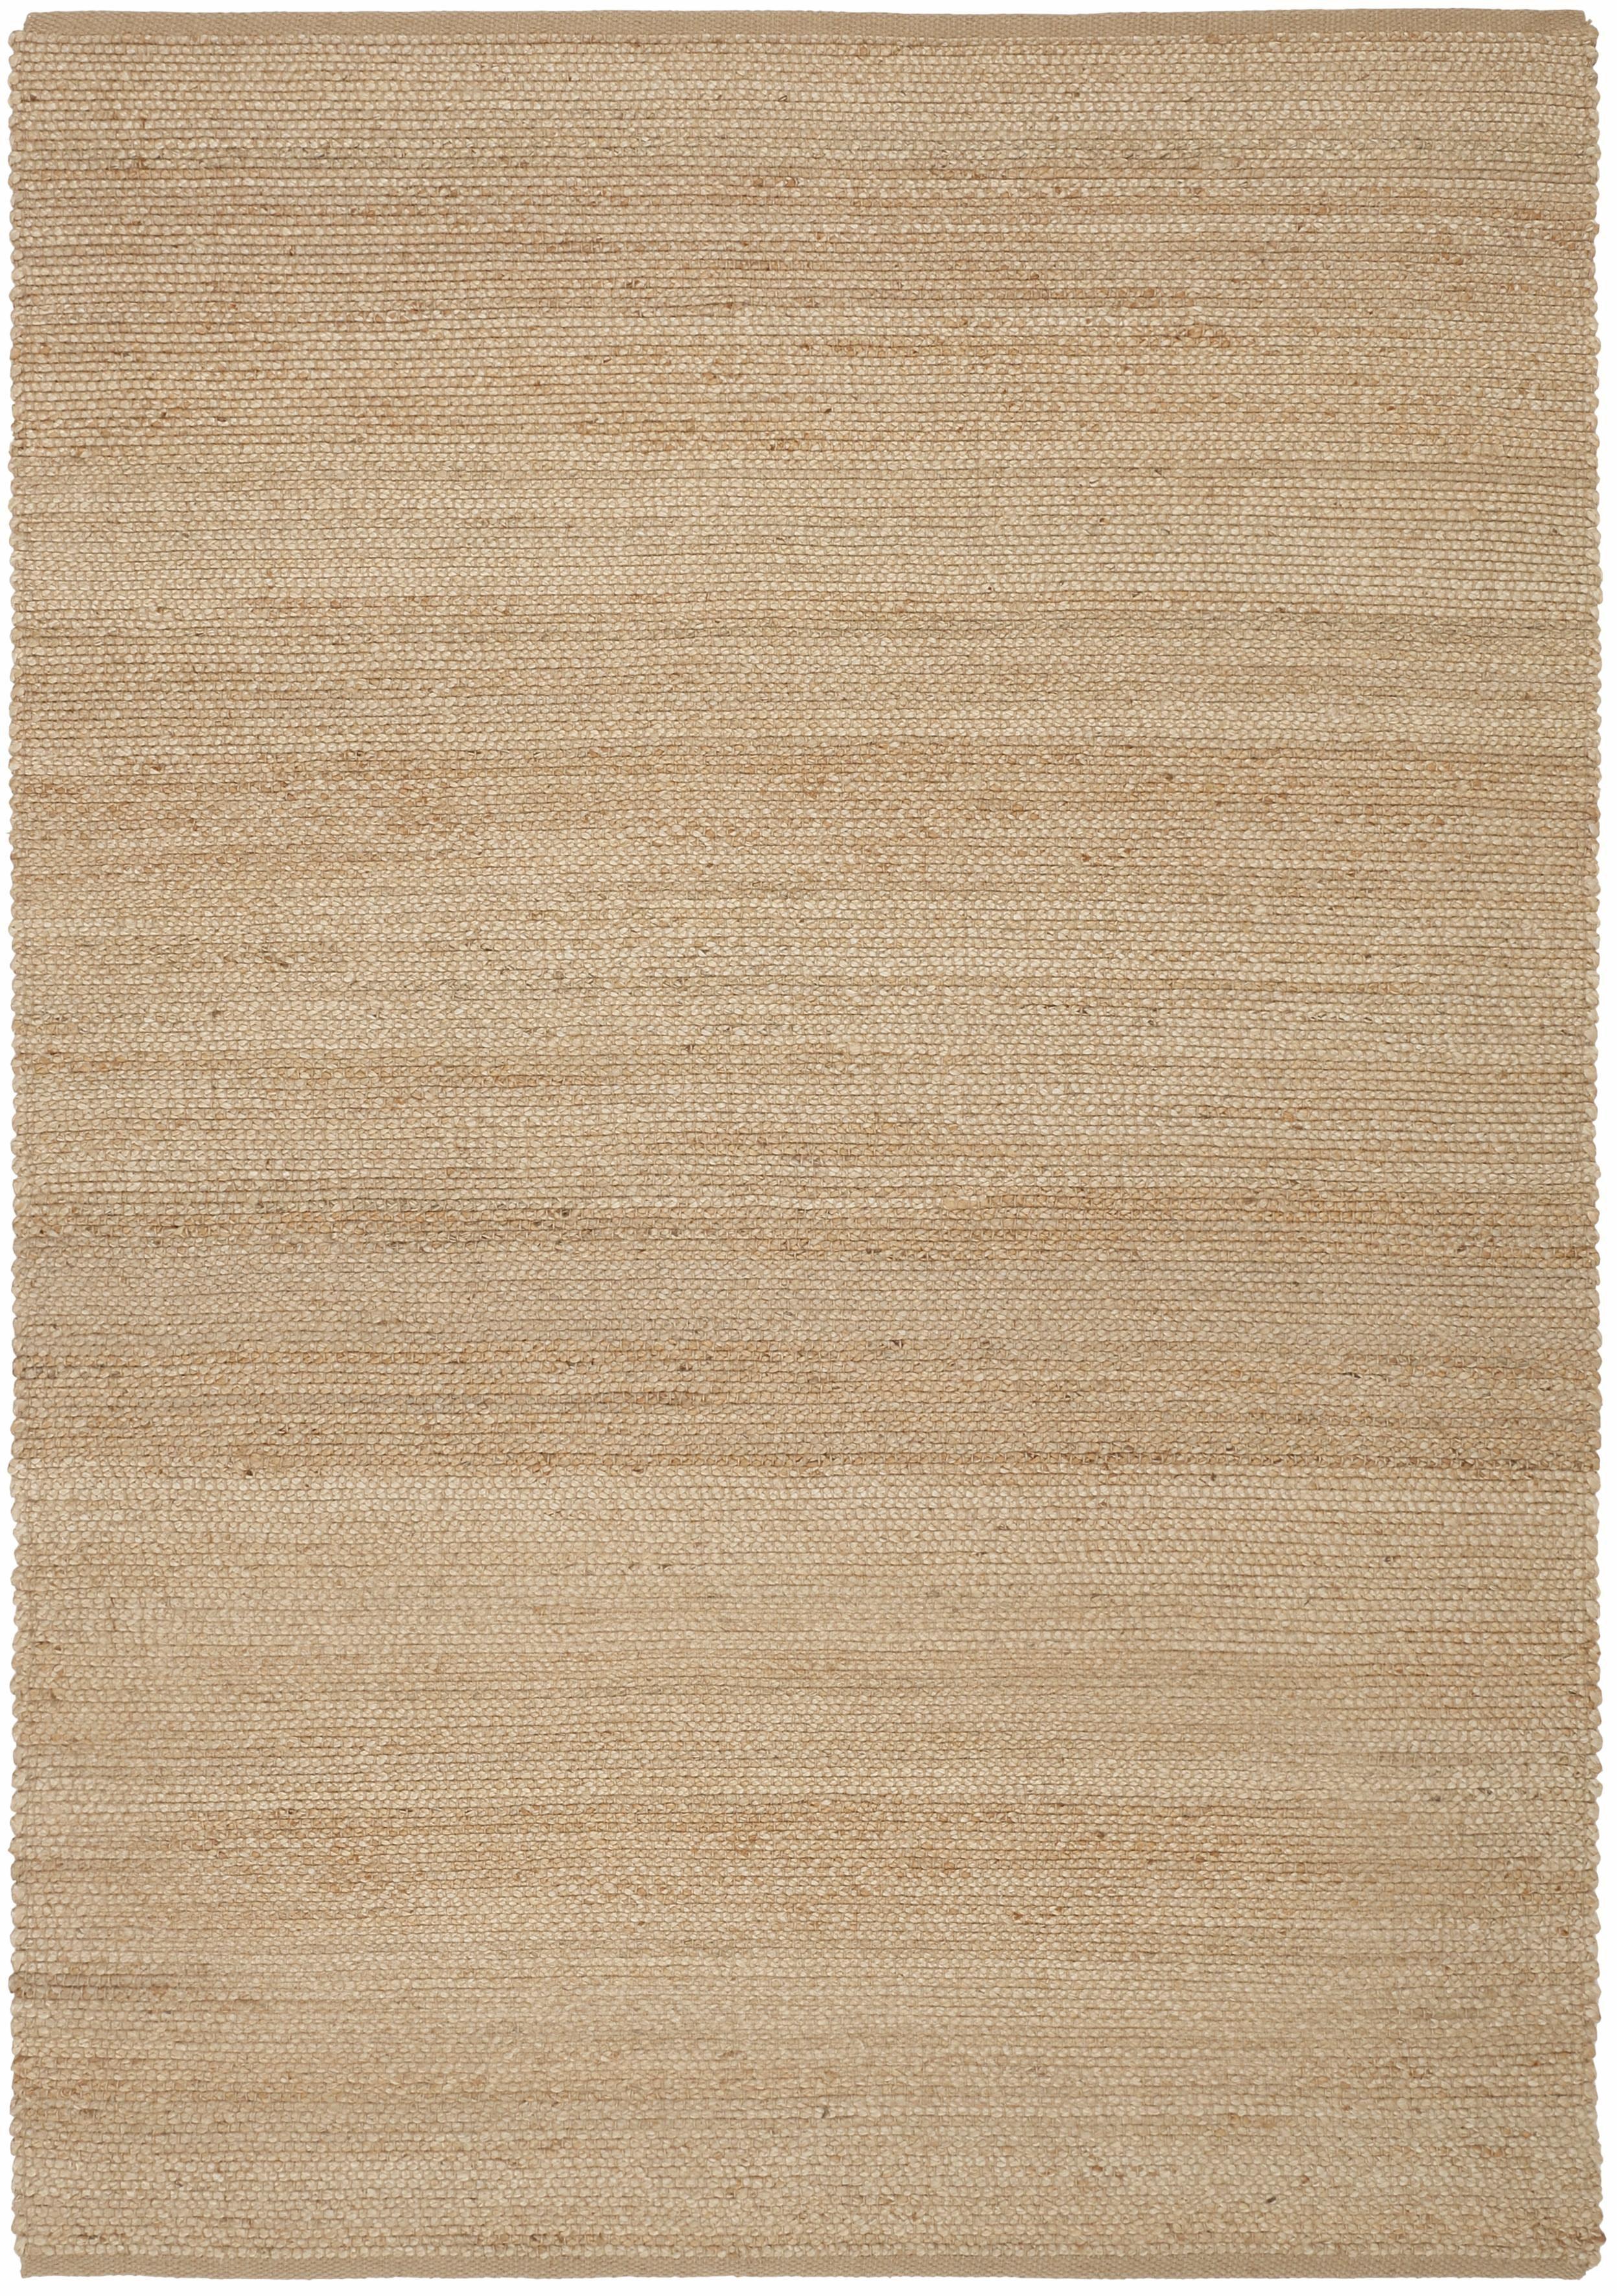 Teppich Hanf Uni Home affaire rechteckig Höhe 5 mm handgewebt